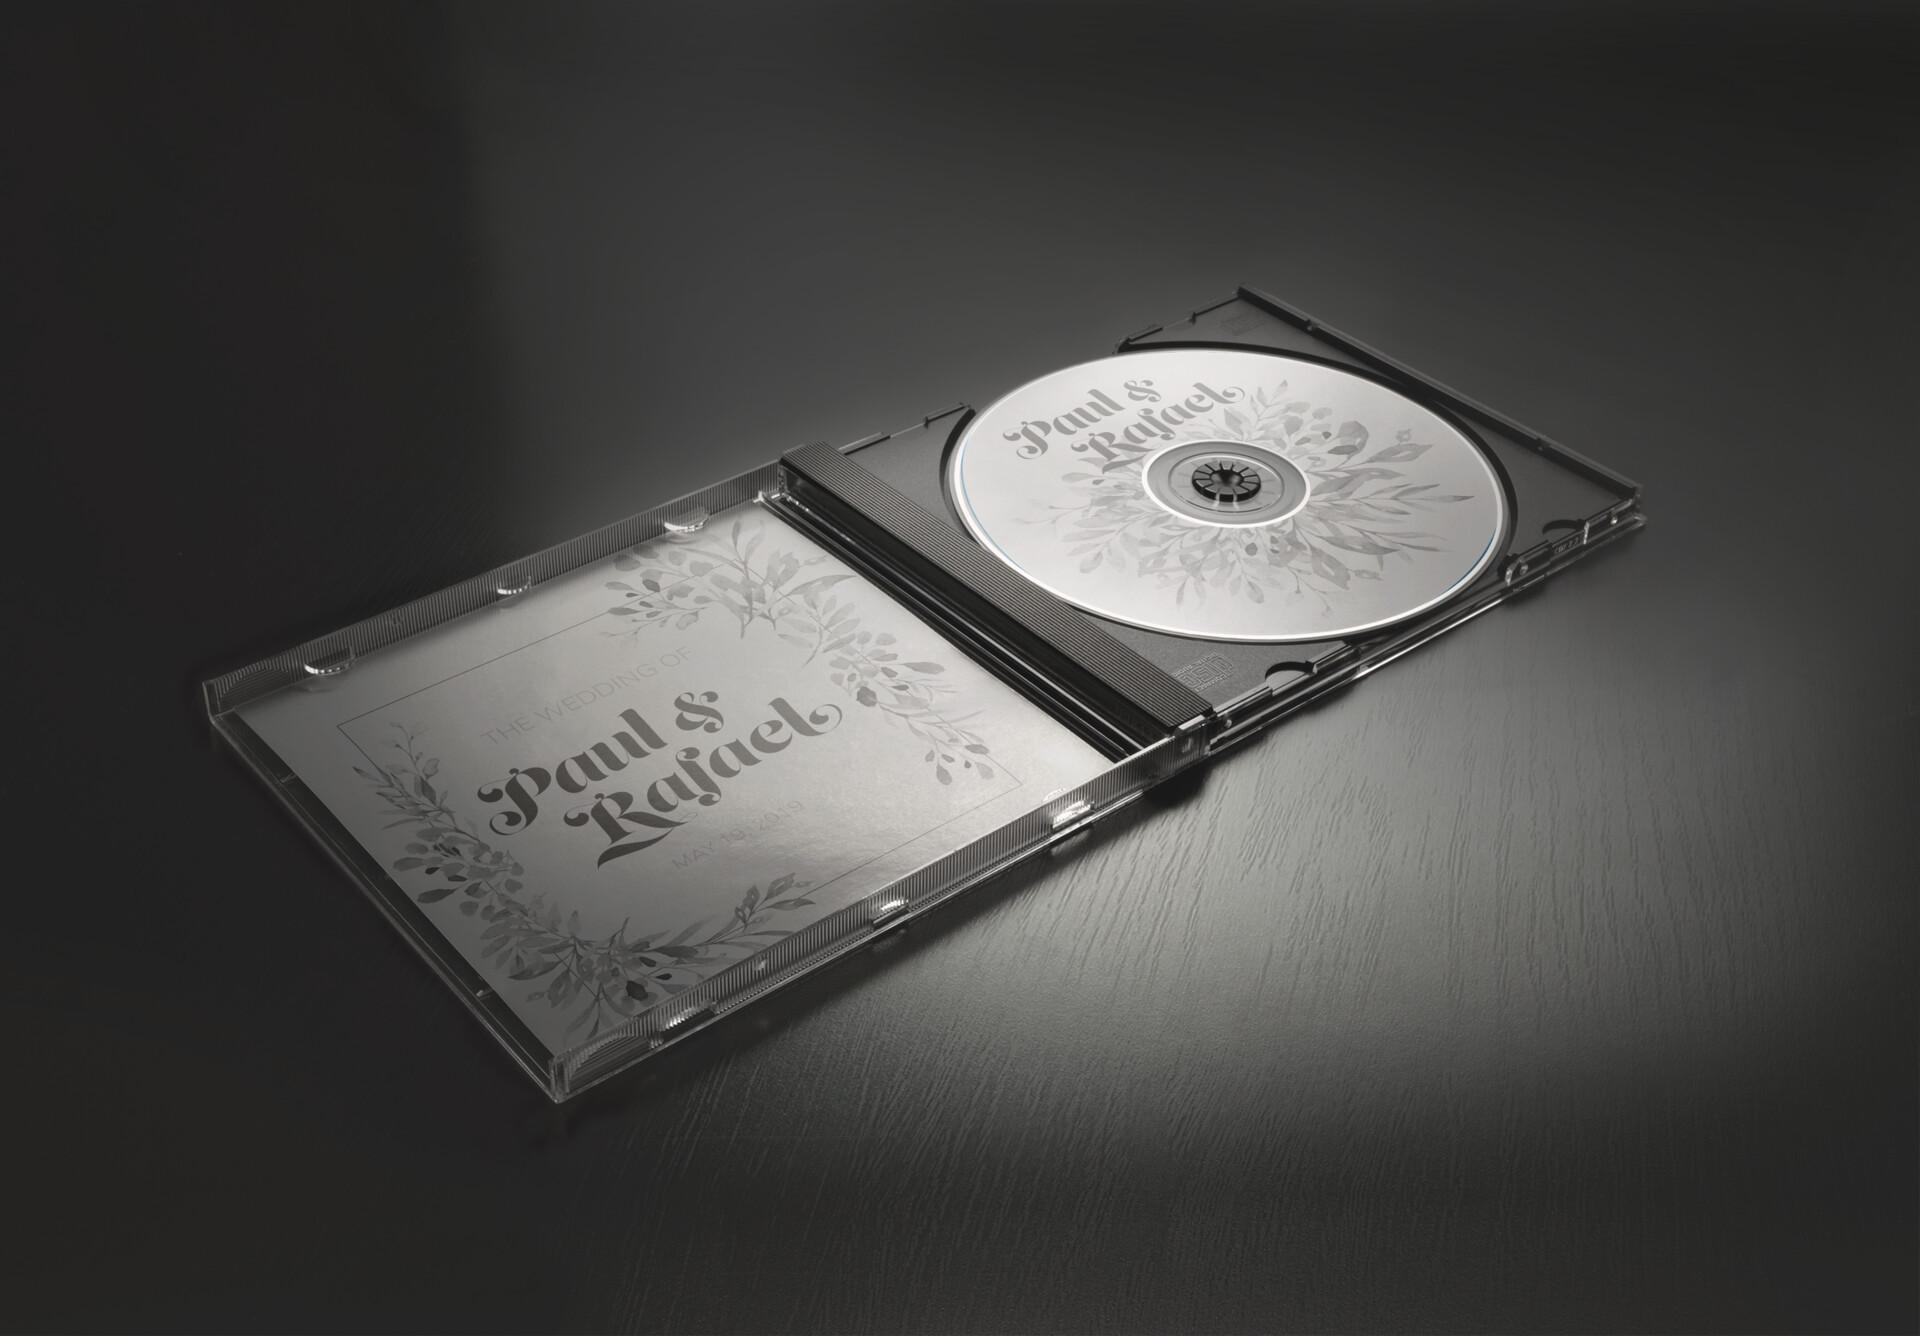 Alecs ganoria dvd inside